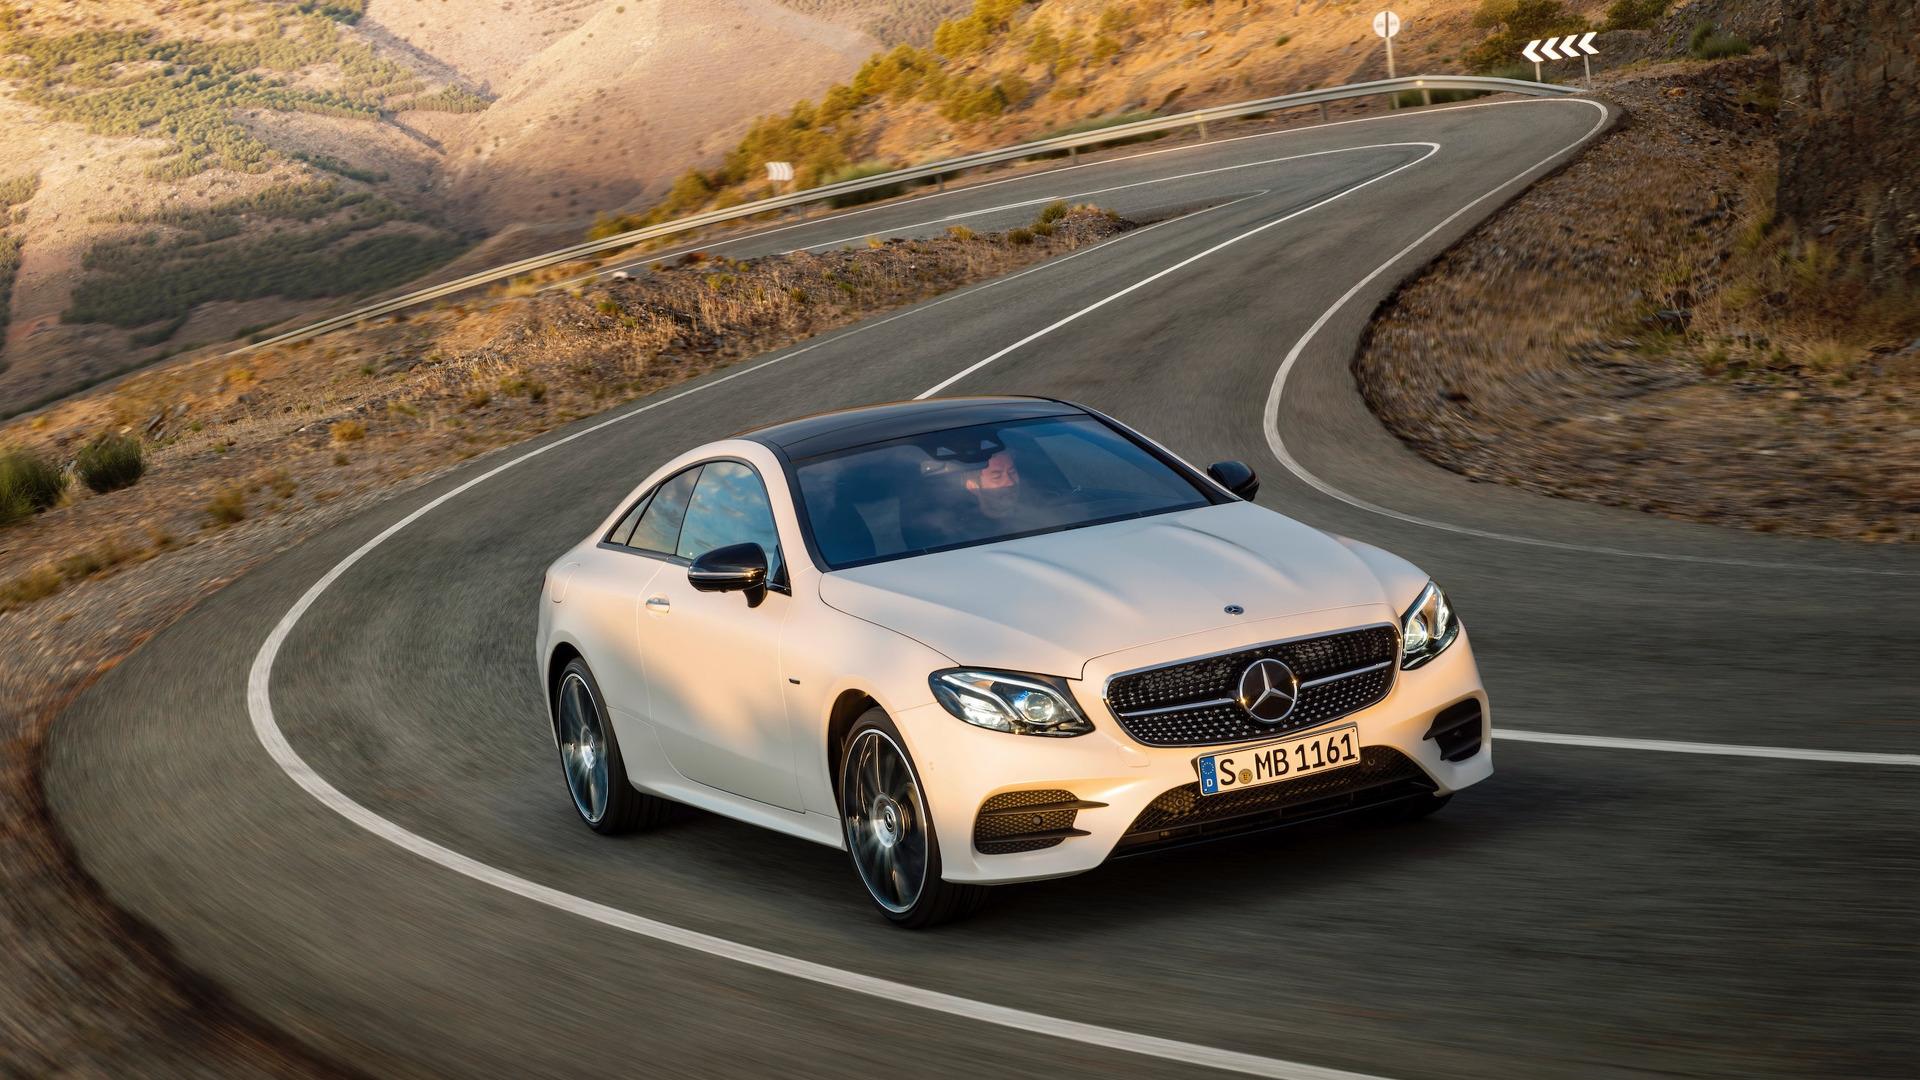 https://icdn-3.motor1.com/images/mgl/OQlKB/s1/2018-mercedes-benz-e-class-coupe.jpg